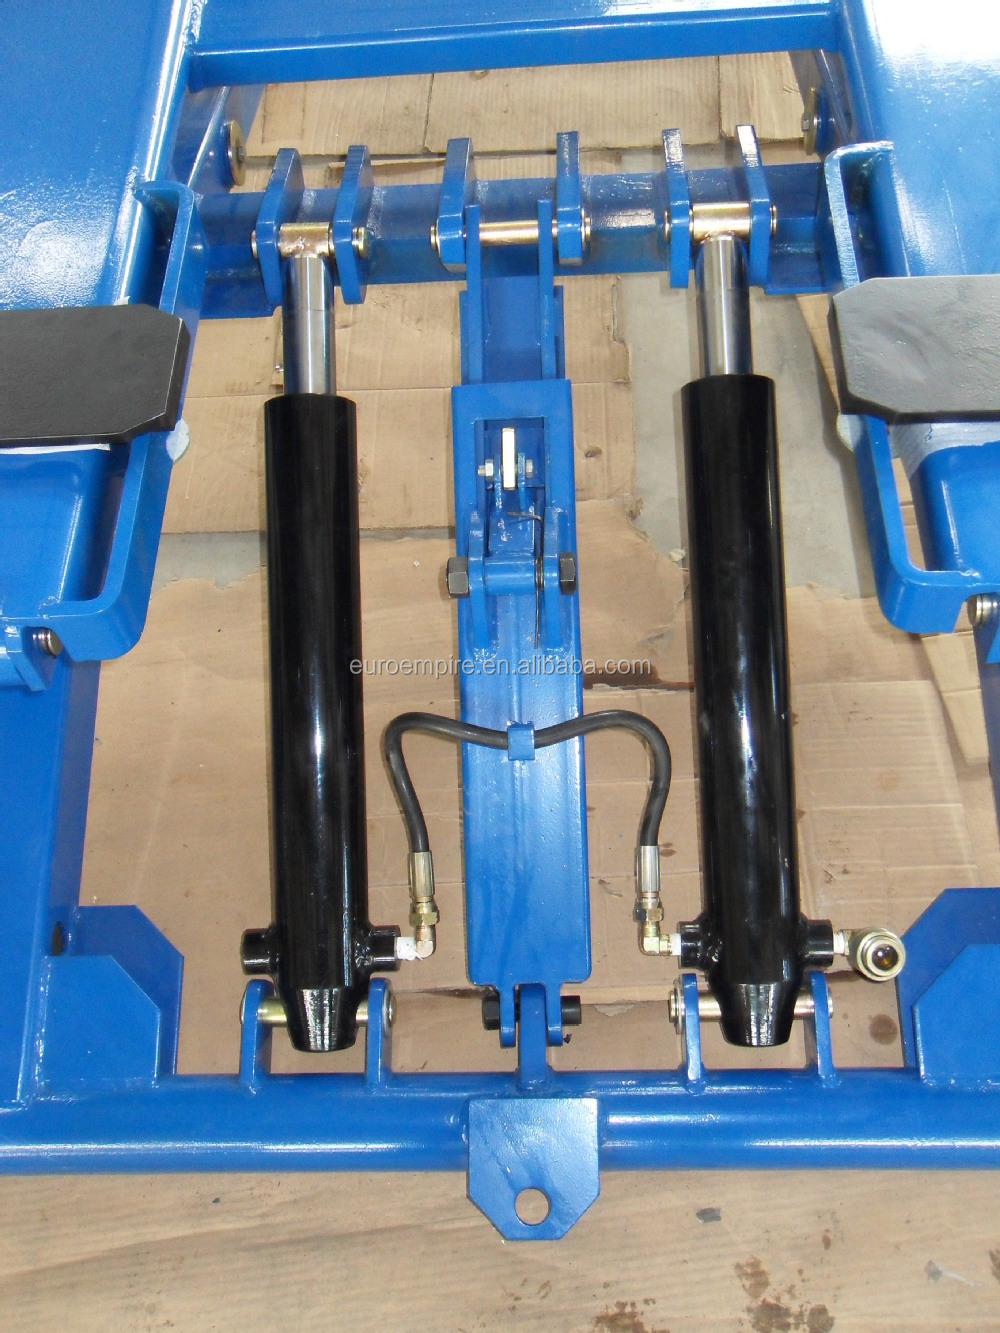 Hydraulic Lift Ramps : Car hydraulic ramps lifts used scissor lift